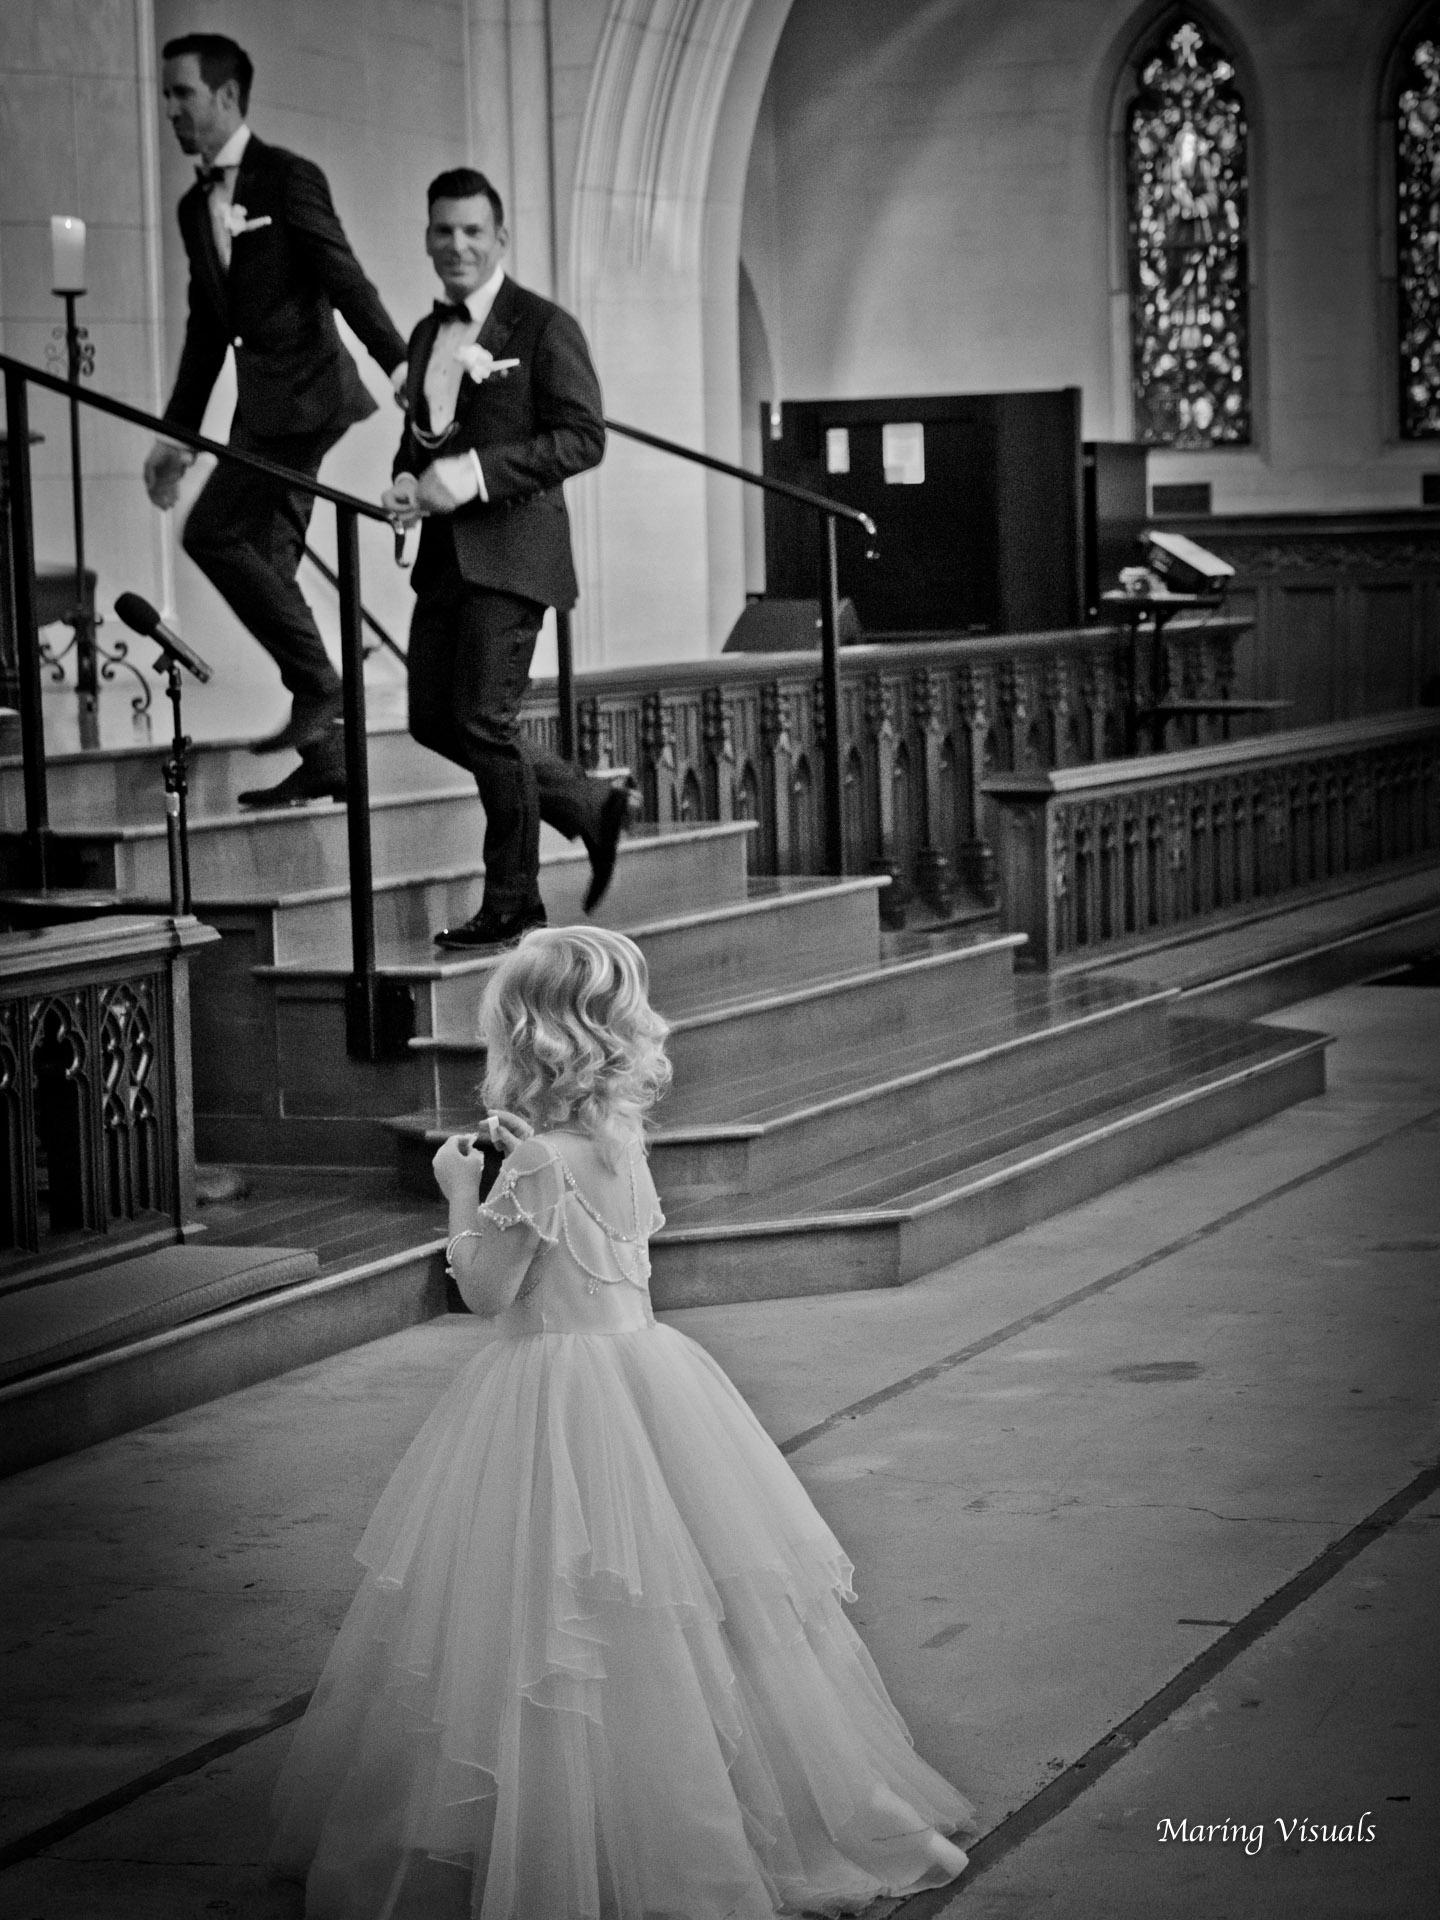 David Tutera Weddings by Maring Visuals 00527.jpg